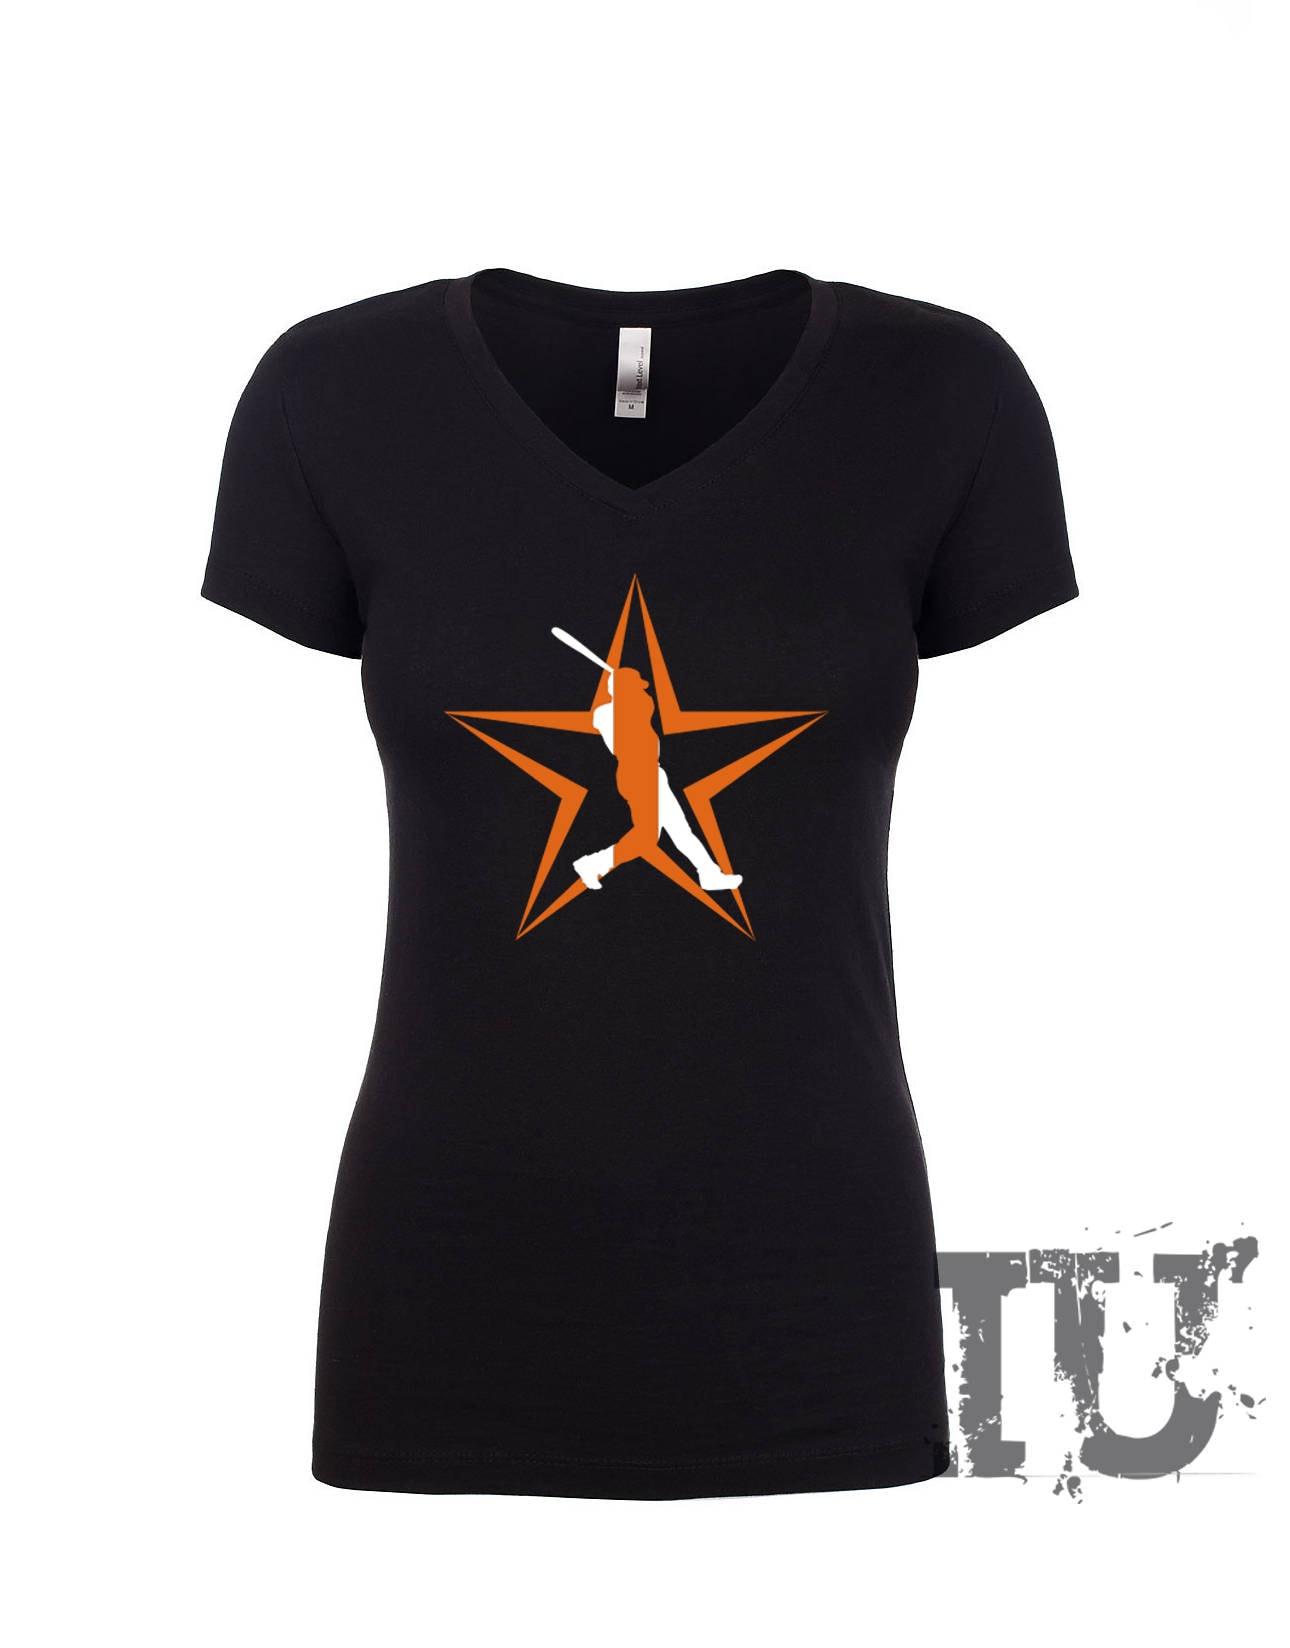 Cheap Custom Shirts Houston - raveitsafe